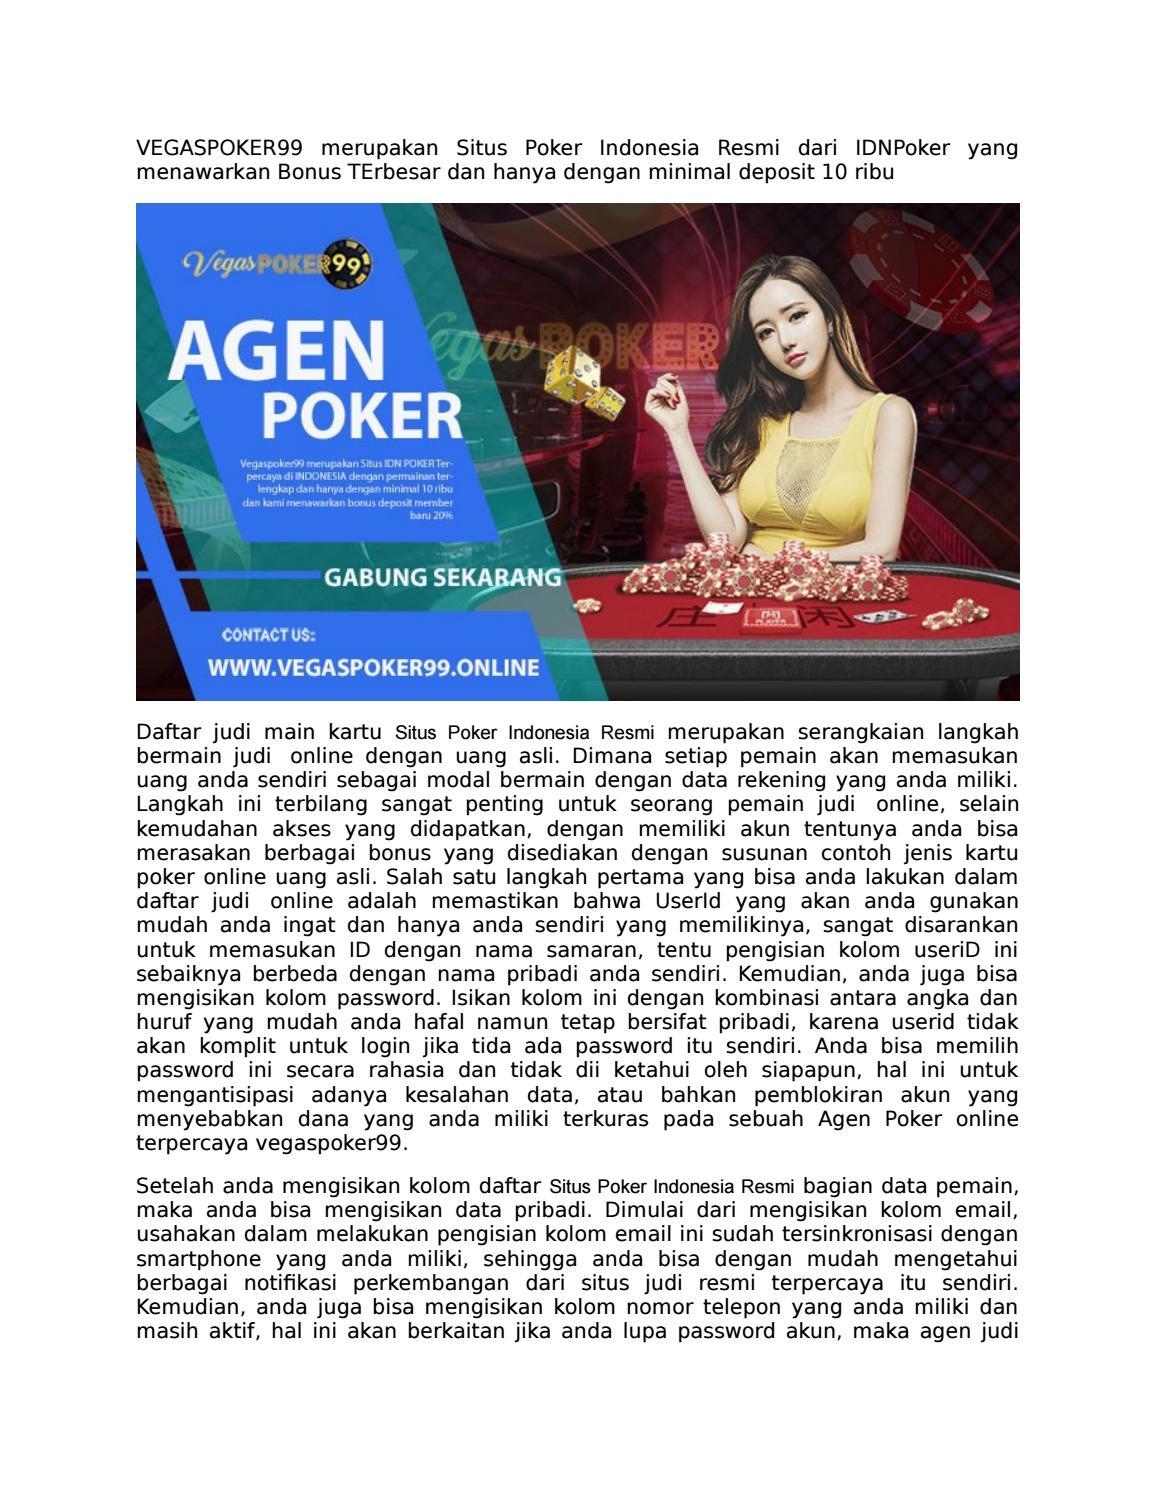 Situs Poker Indonesia Resmi Minimal Deposit 25 Ribu By Vegaspoker99 Issuu